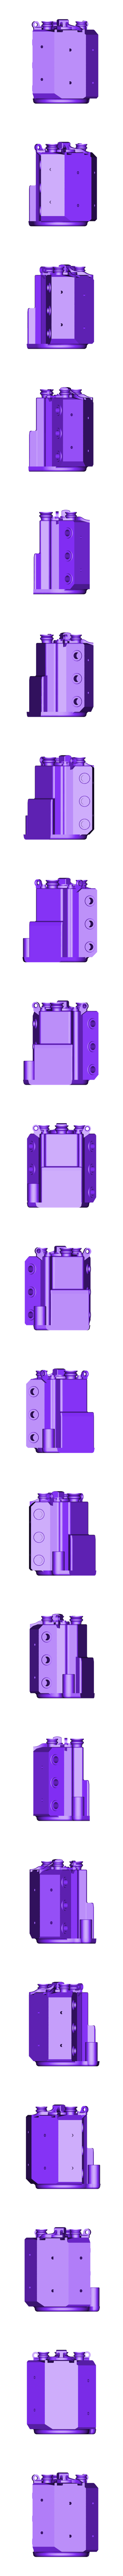 01FR-BLOCK-V8.stl Download STL file Ratrod Pickup • 3D printing template, macone1